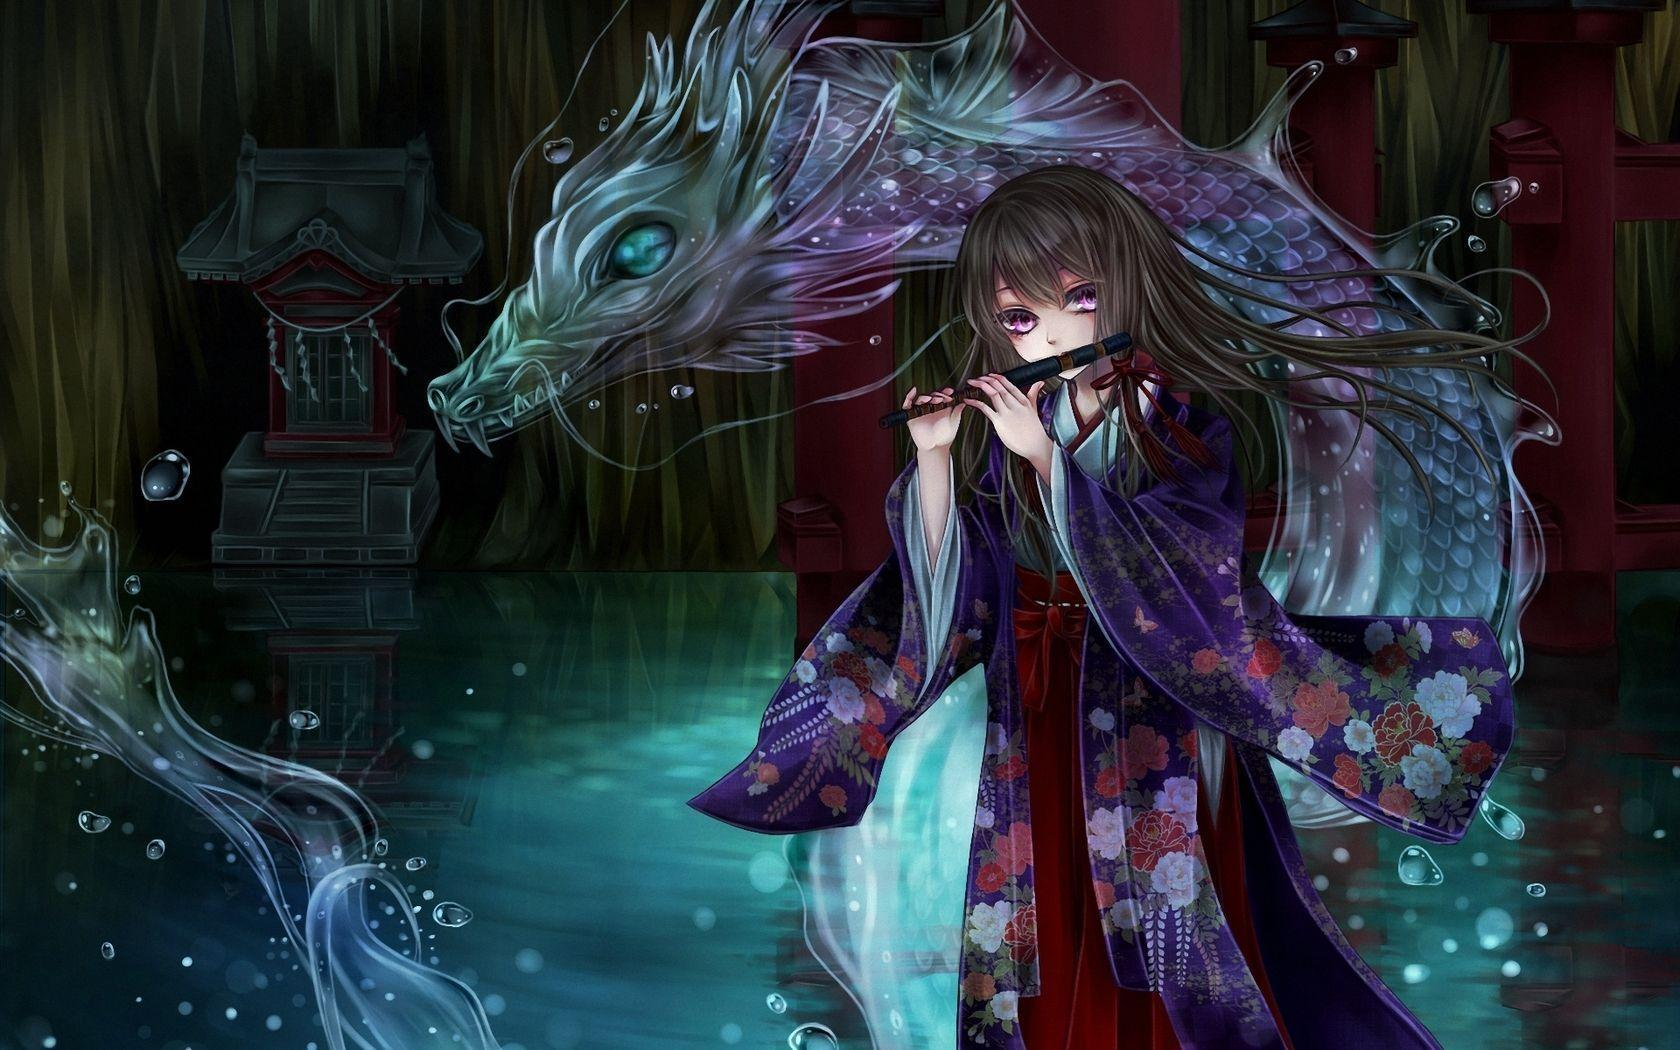 Anime Dragon Wallpapers - Top Free Anime Dragon Backgrounds